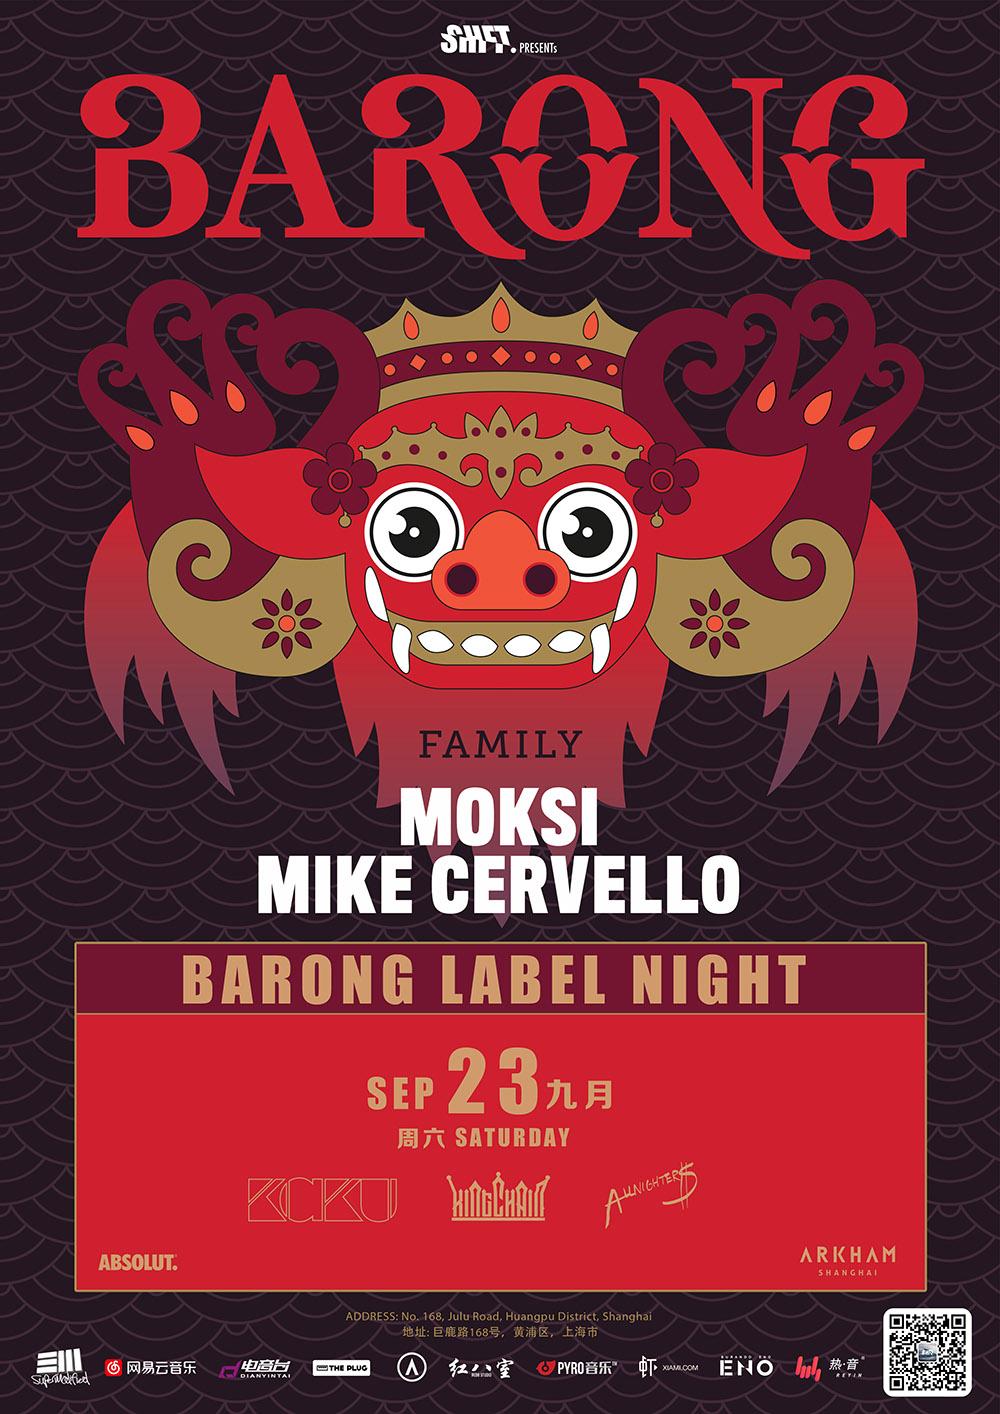 Barong Label Night KV - Updated.jpg